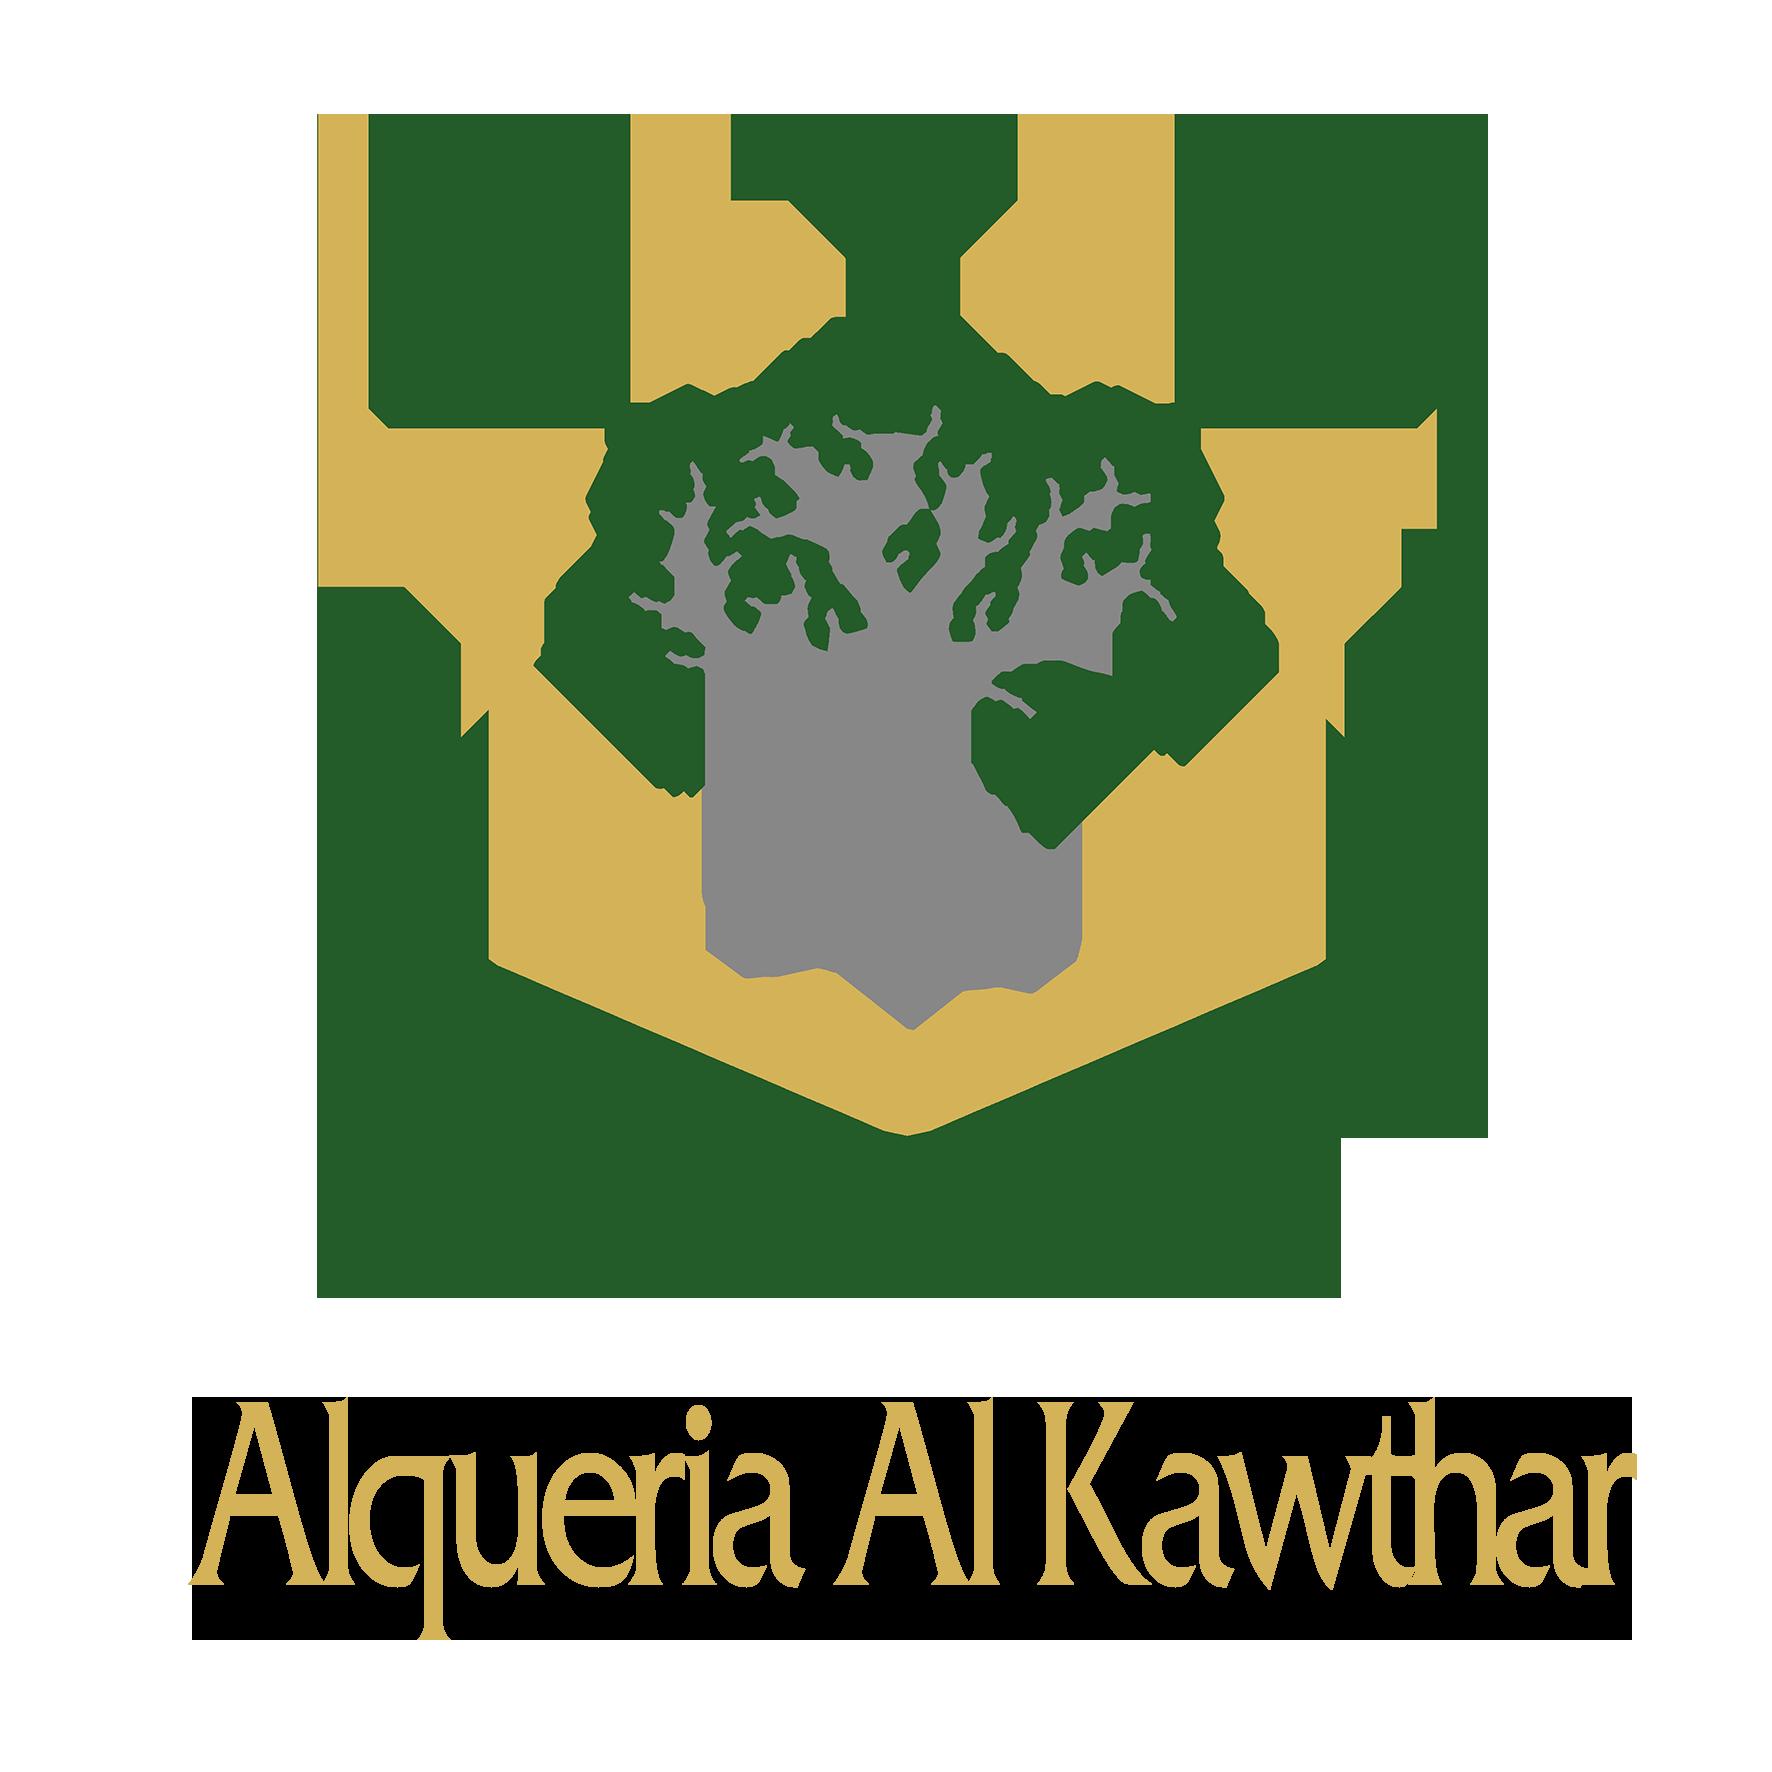 Alqueria Al-Kawthar